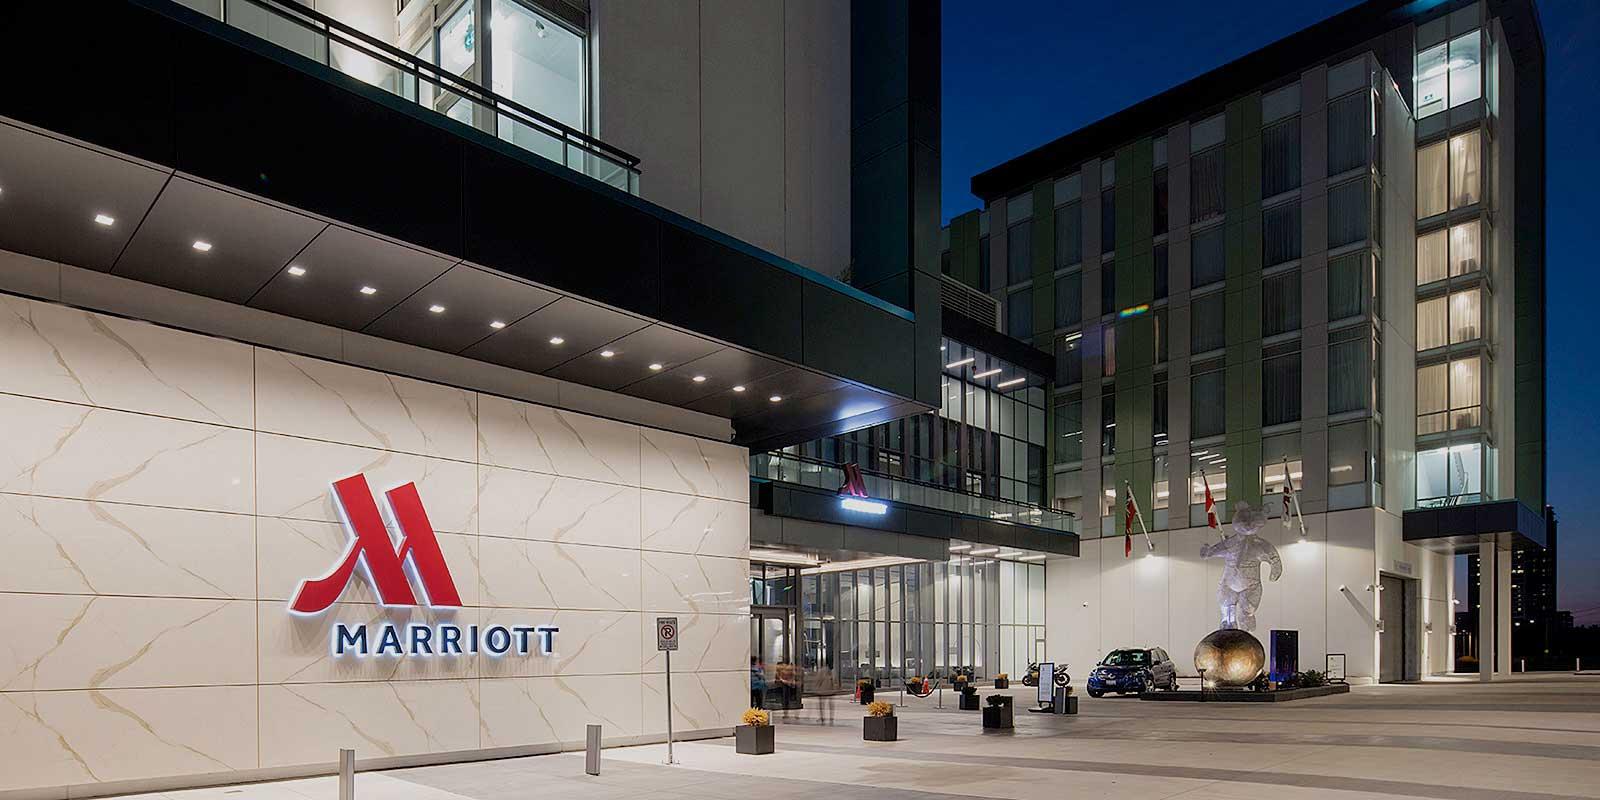 Toronto Marriott Markham Now Open!